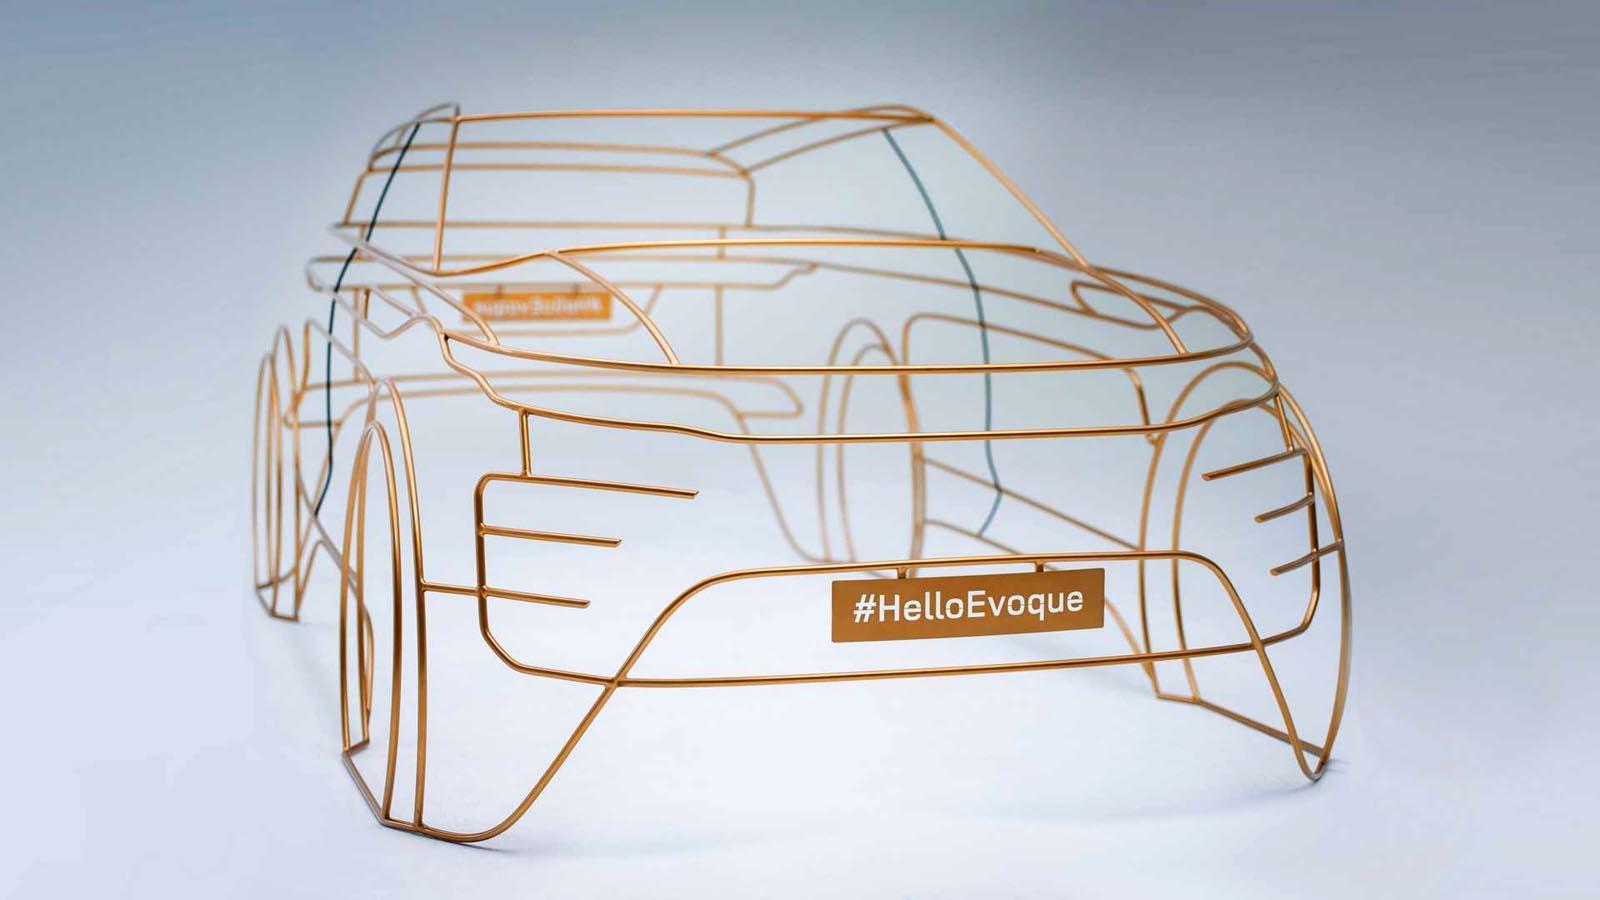 Photo of Η παγκόσμια παρουσίαση του νέου Land Rover Evoque στην Ελλάδα